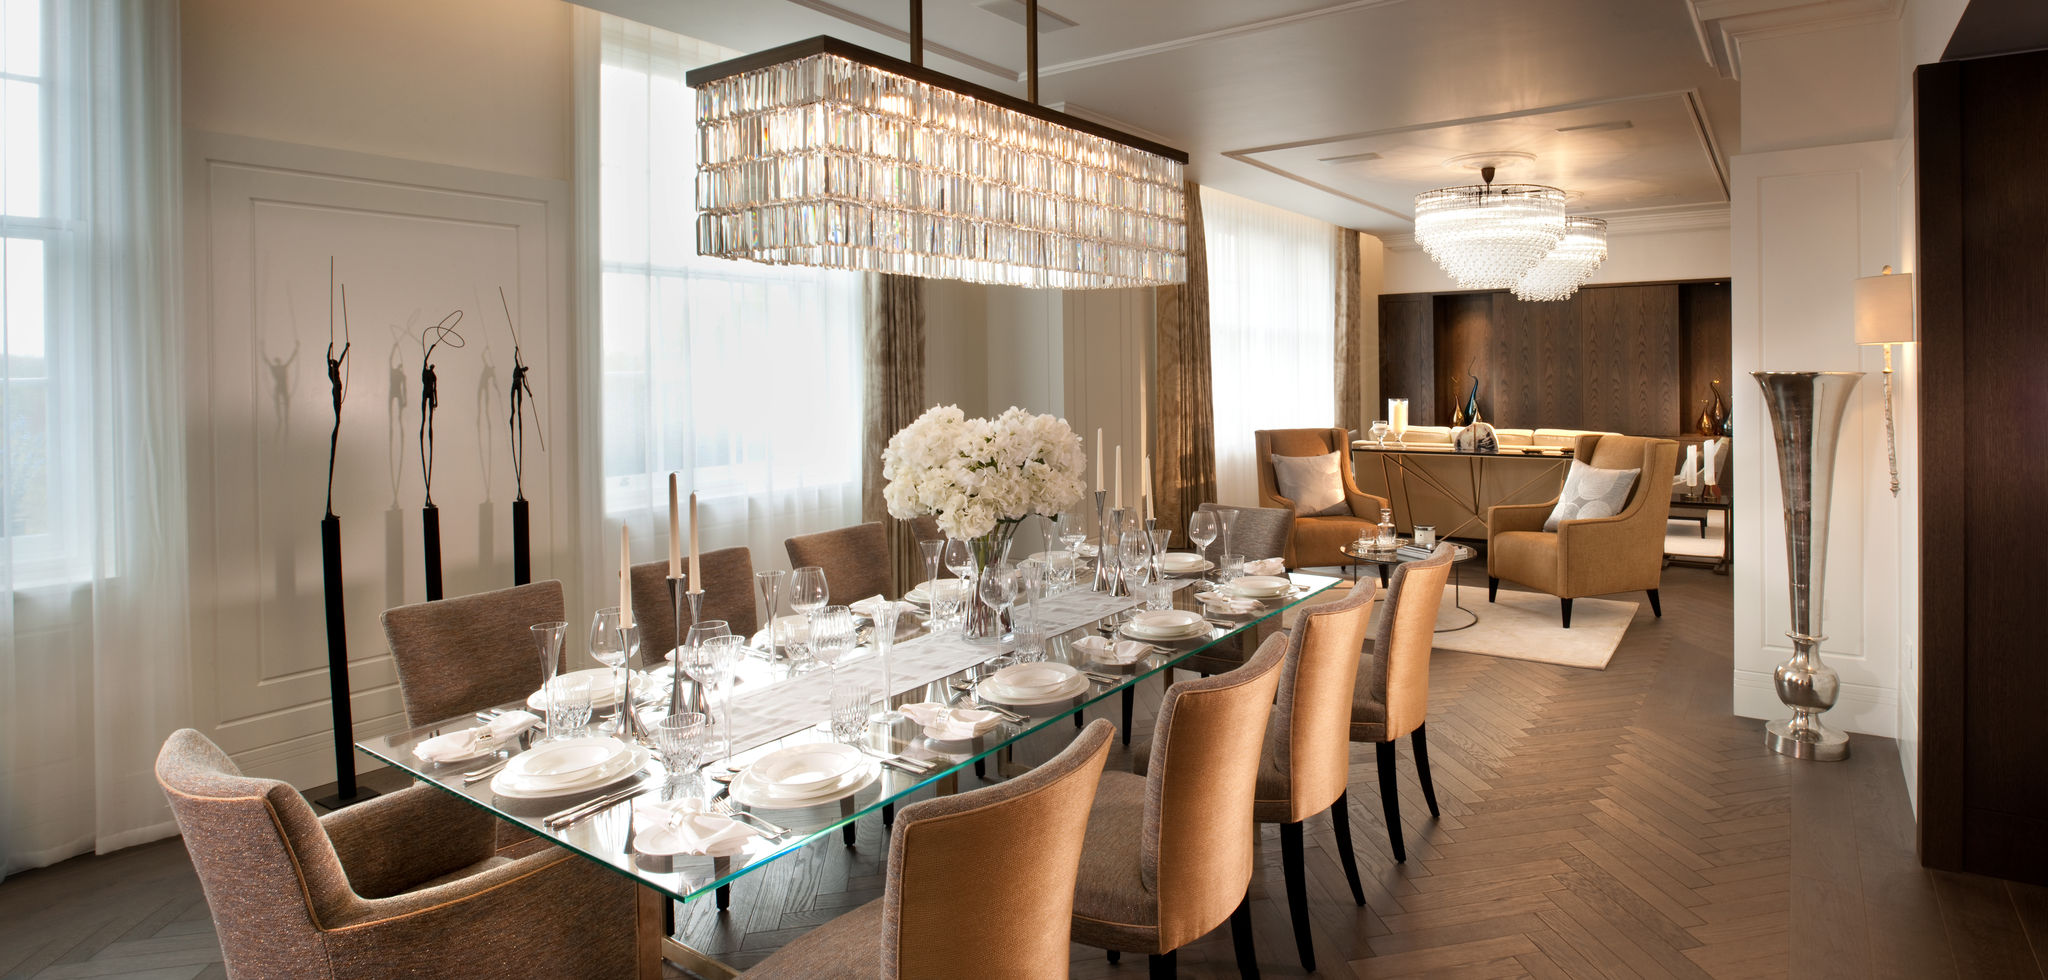 Flairlight innovative LED lighting - dining